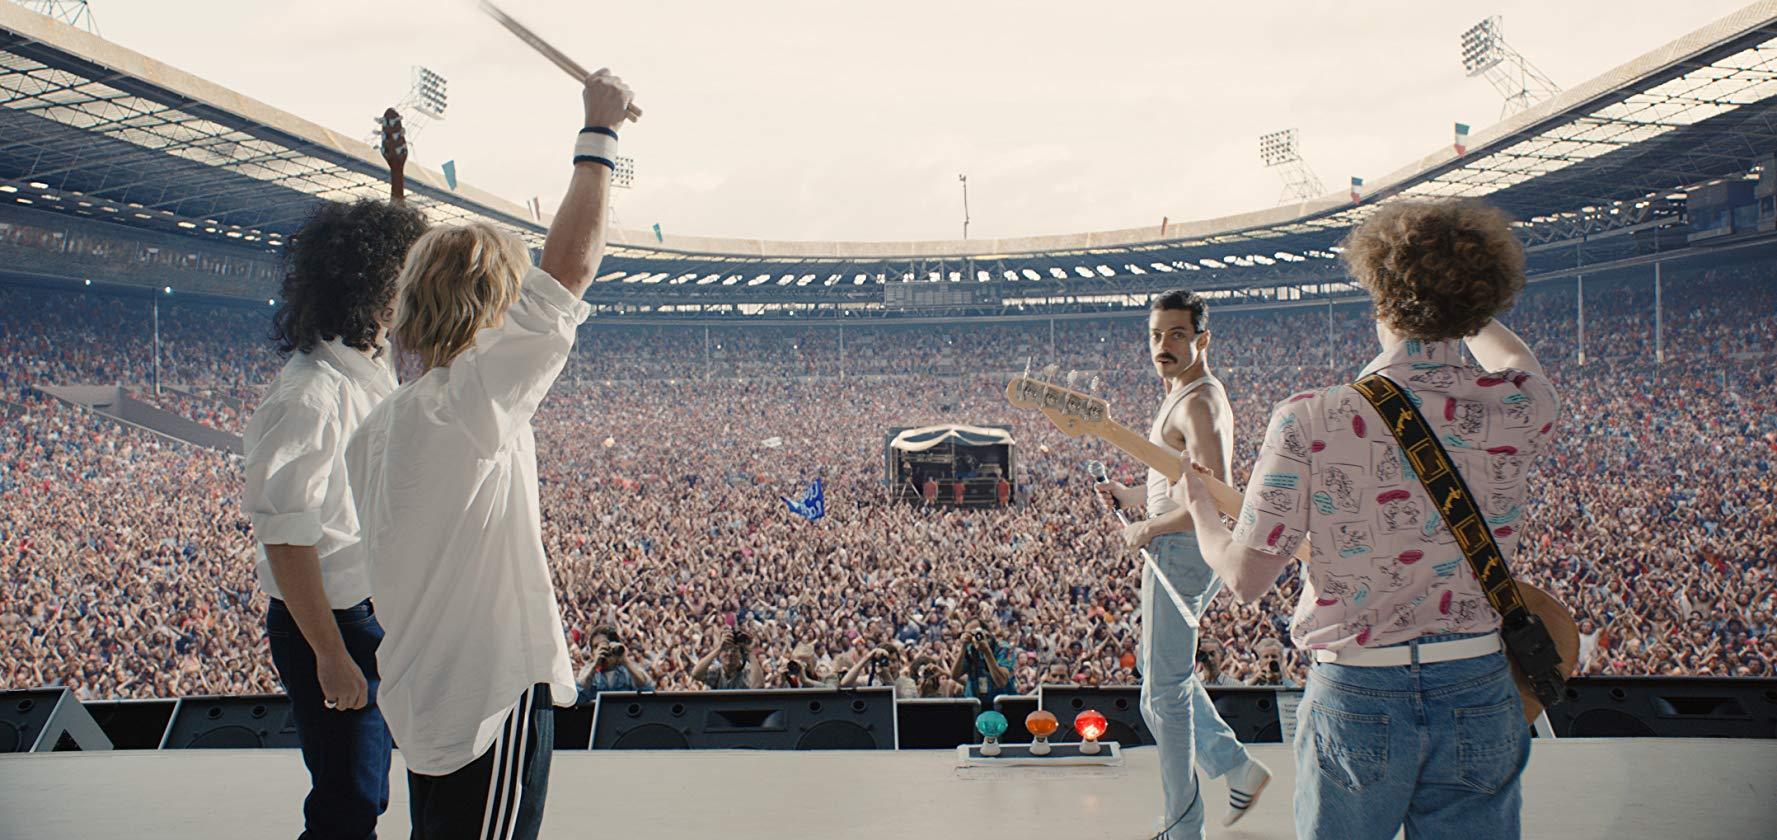 Рецензия на фильм «Богемная рапсодия» / Bohemian Rhapsody